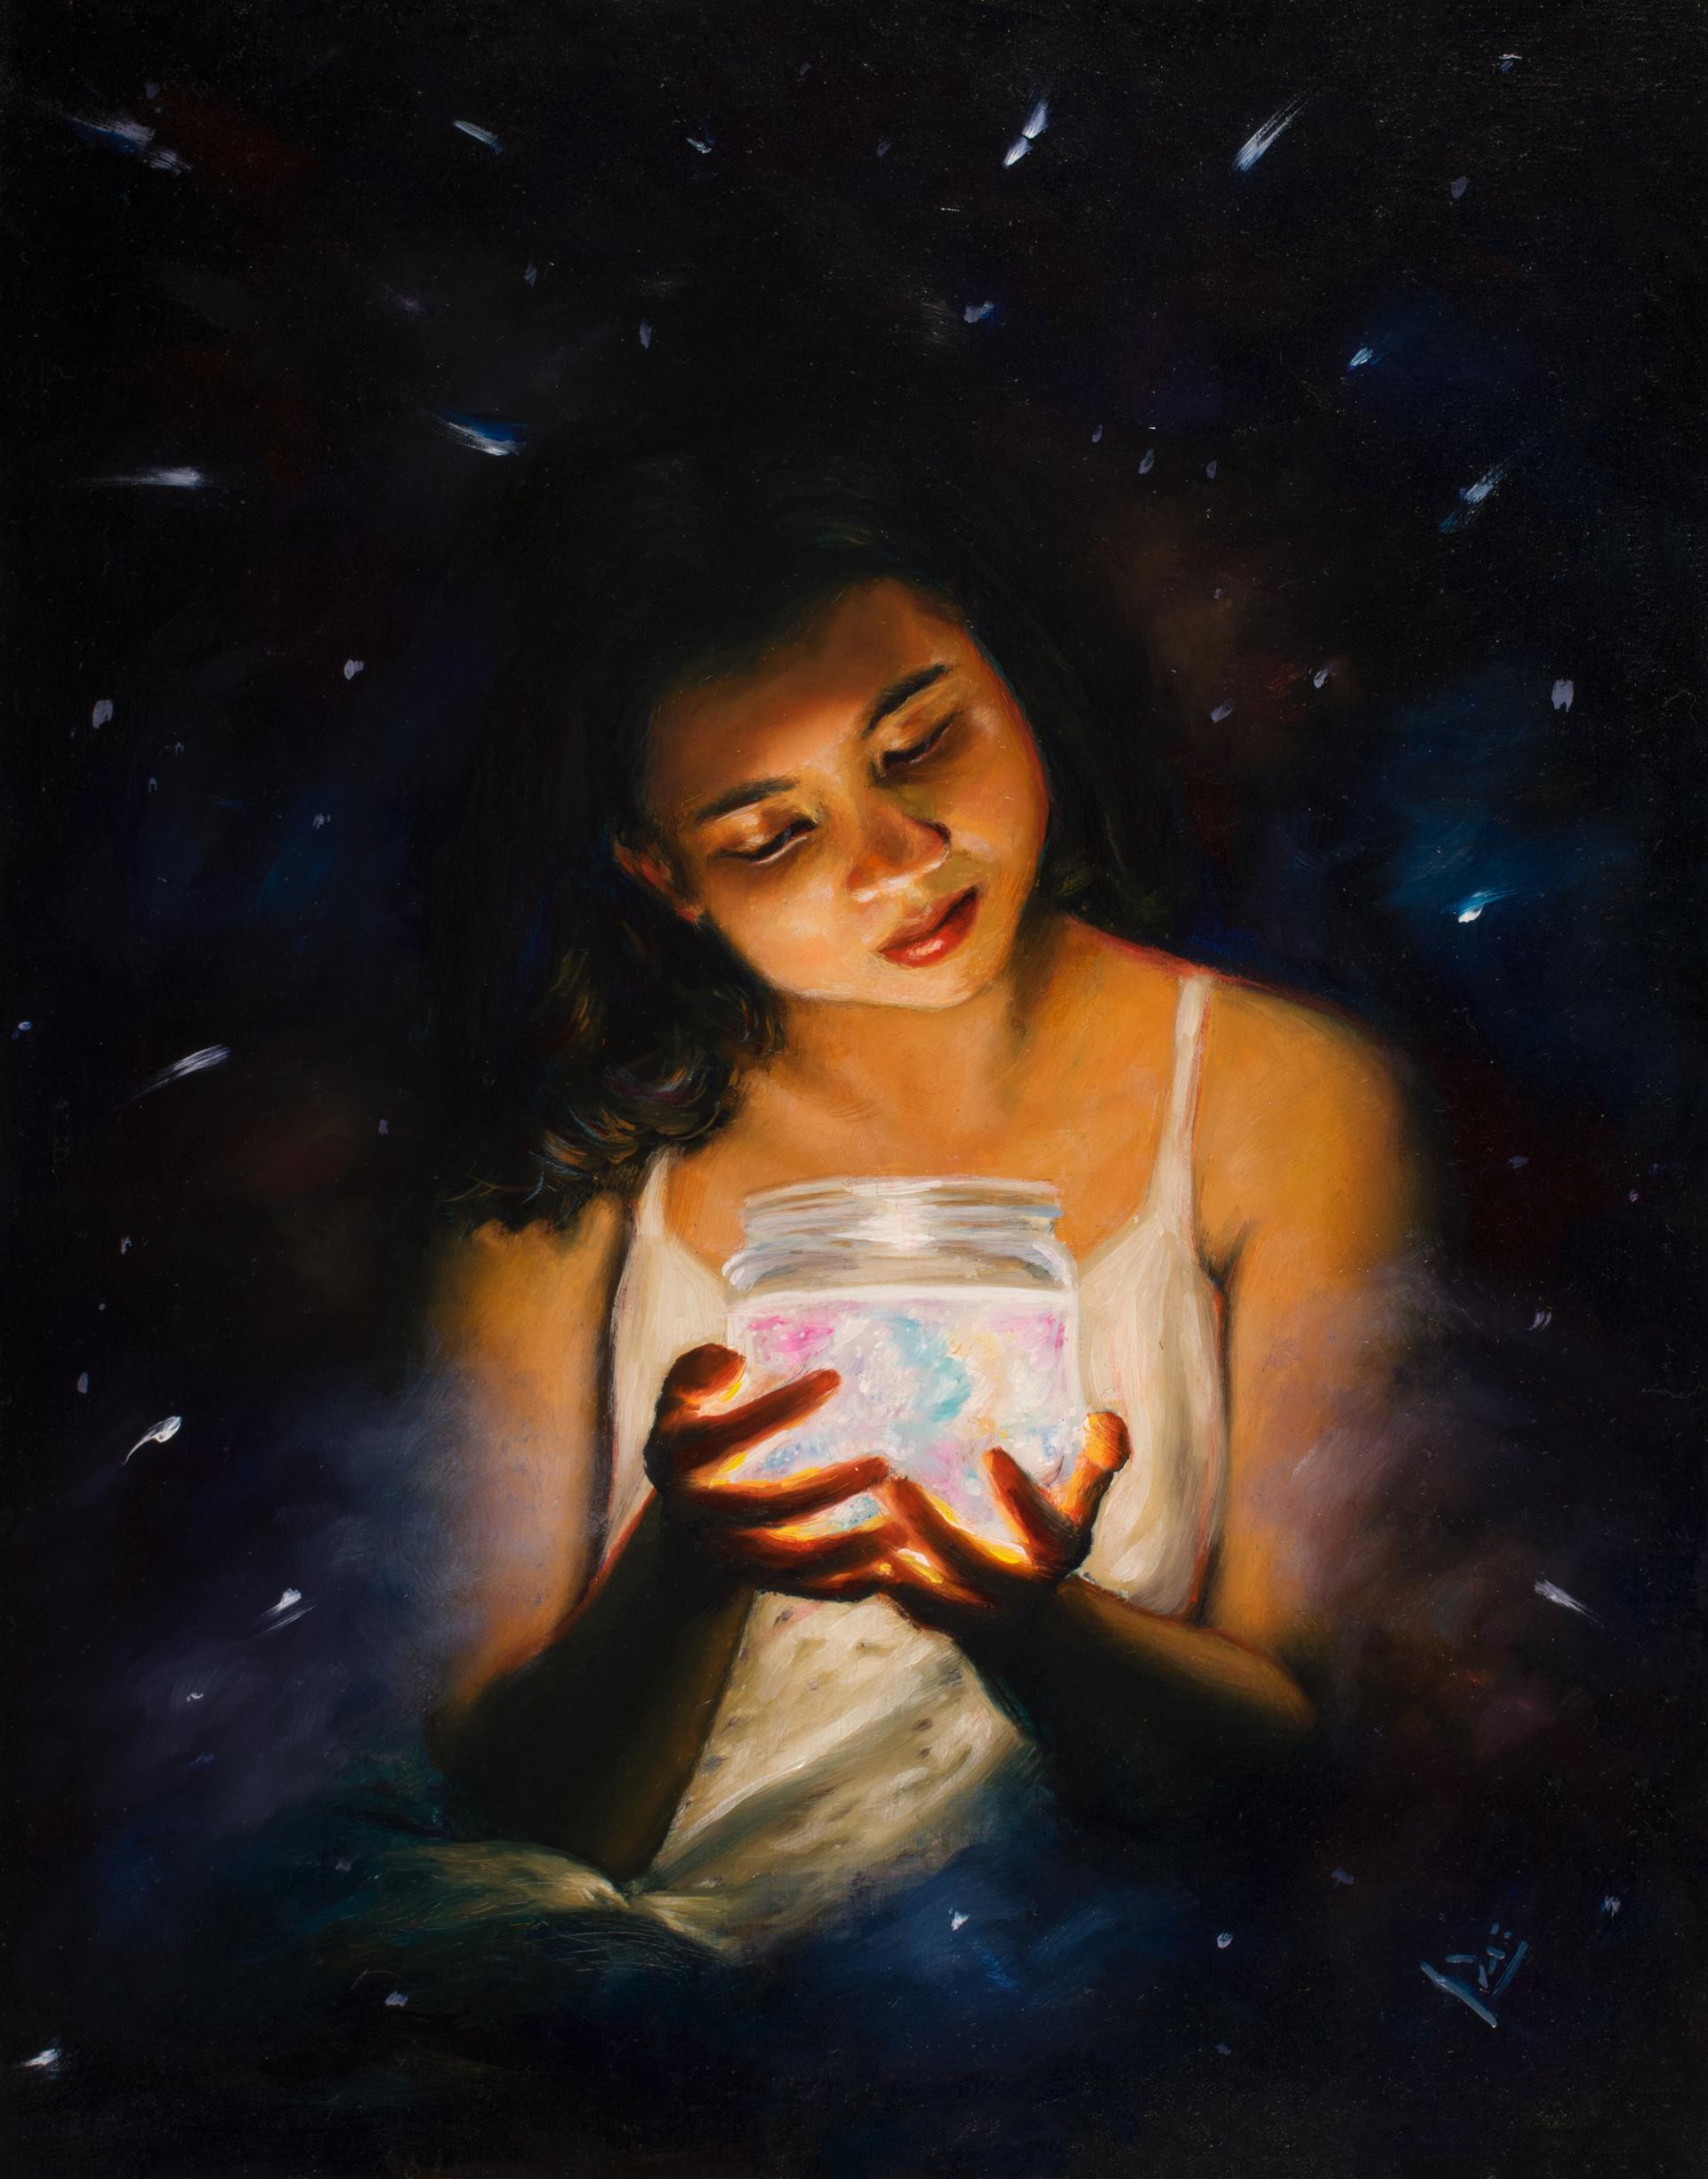 Pocket Full of Dreams by Tiffany Dae